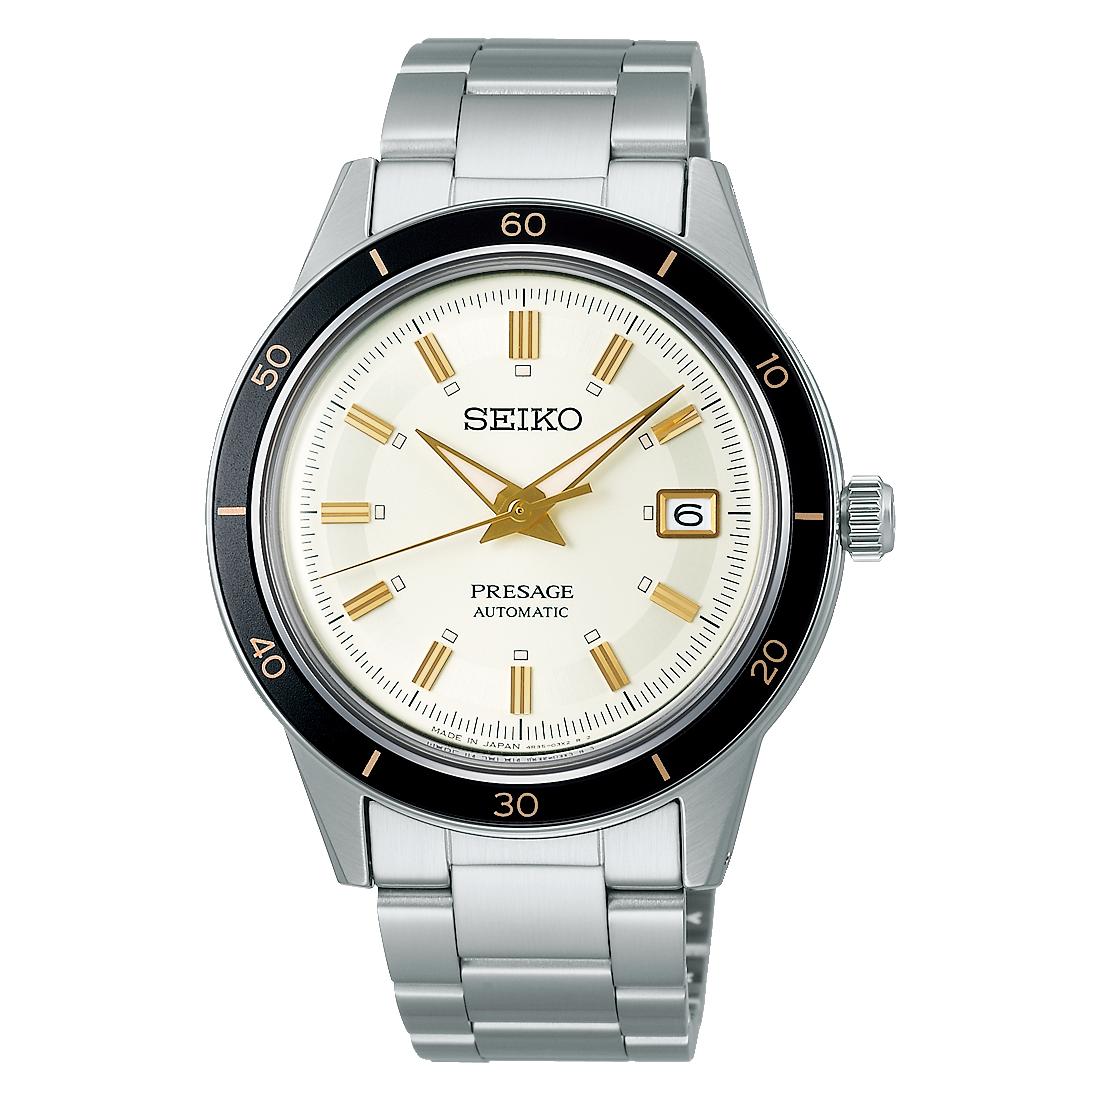 Orologio Seiko Presage SRPG03 J1